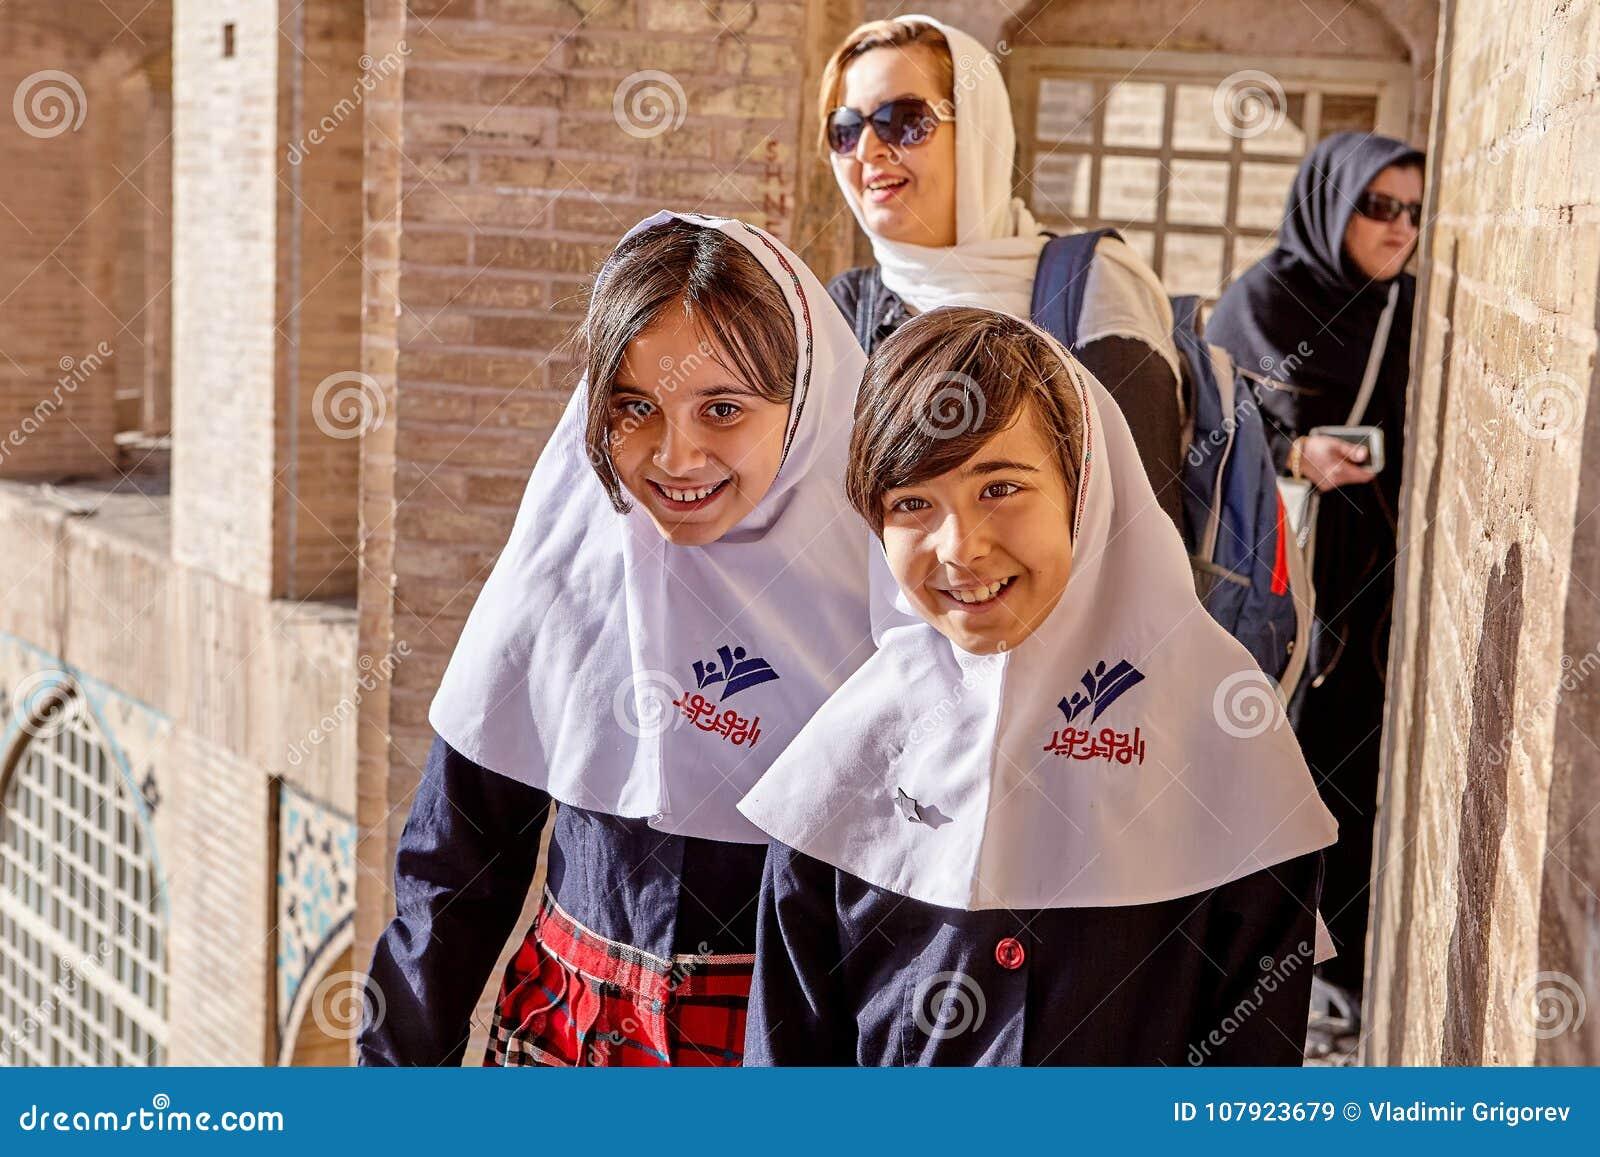 b307f7283df9 Iranian Girls In School Uniform Smiling On Sunny Day